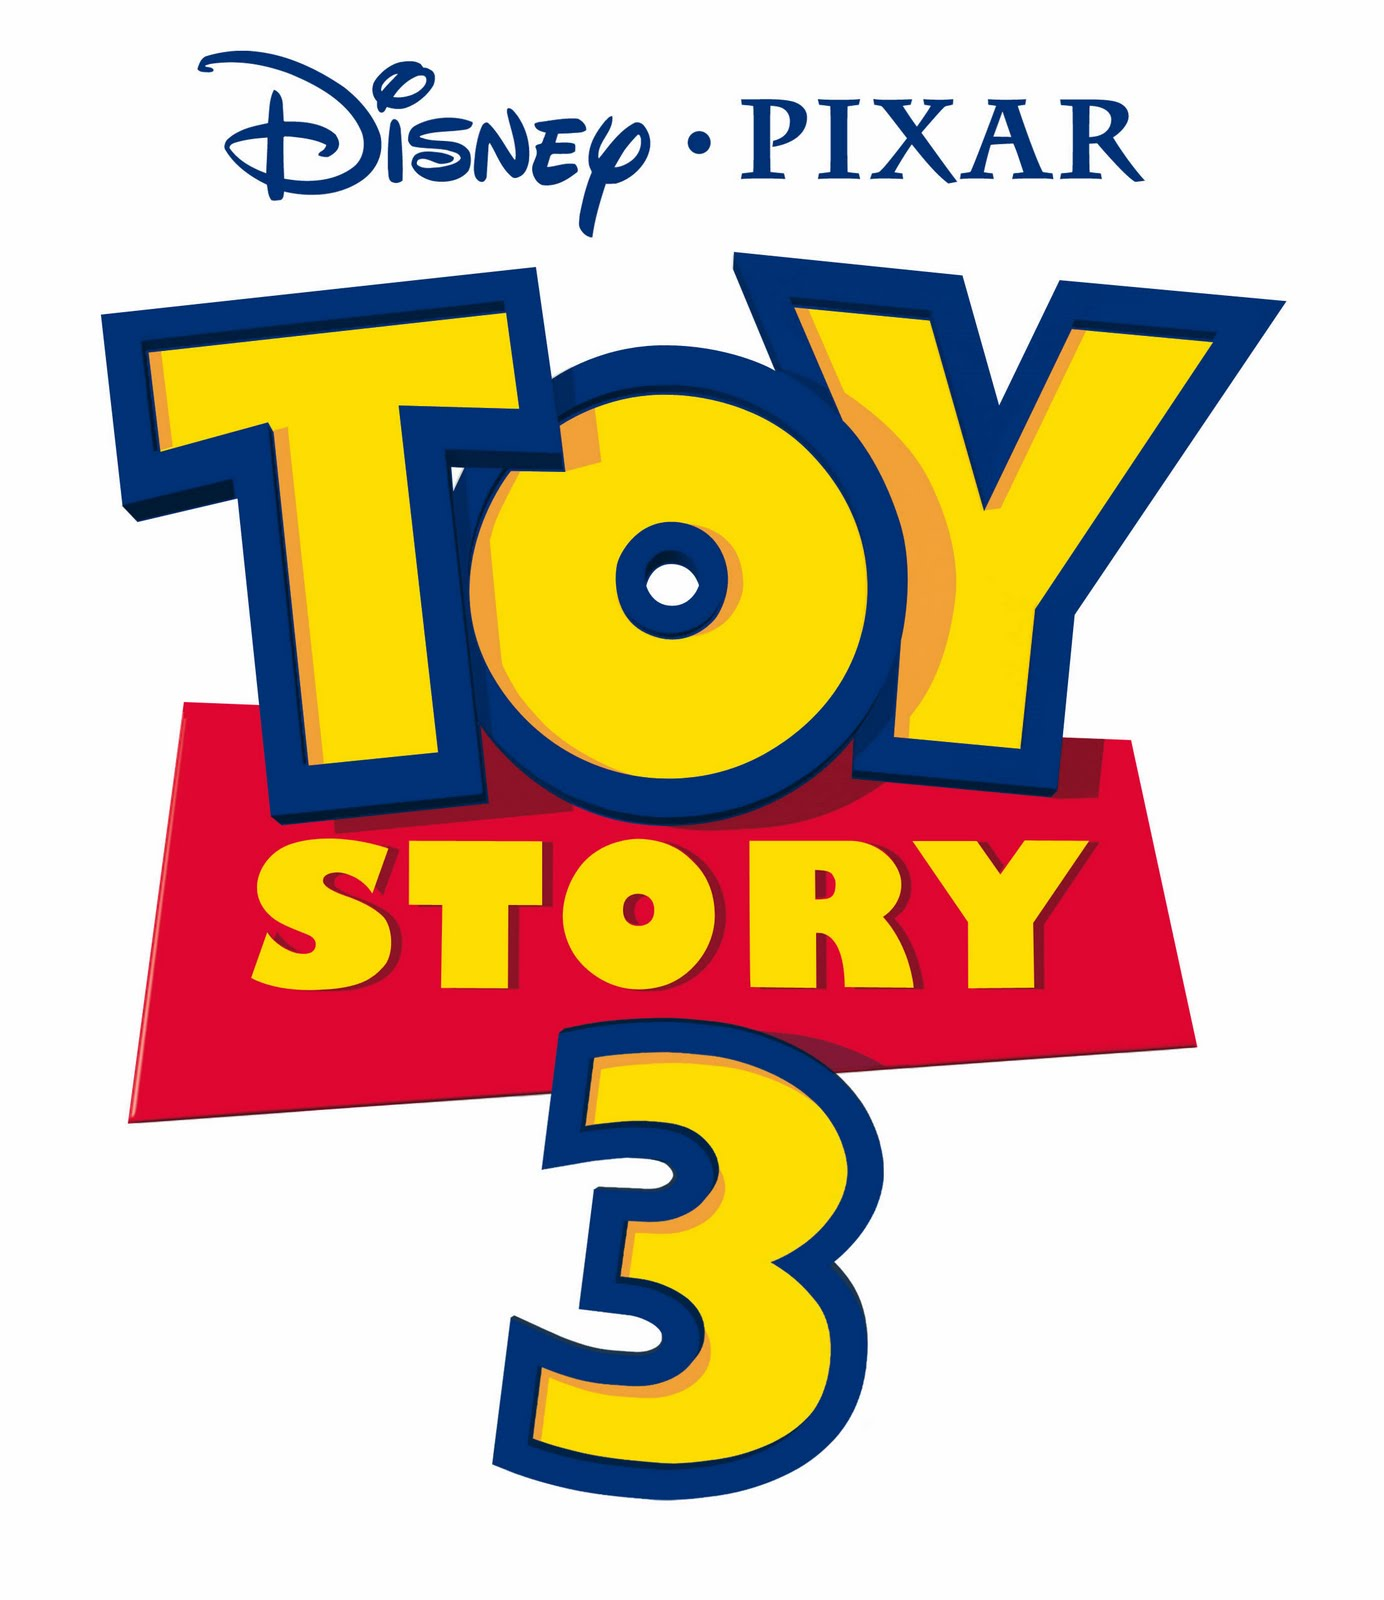 http://2.bp.blogspot.com/_lcDalD63nts/TGmF9mk4yII/AAAAAAAABh0/b6VJsynryTM/s1600/toy_story_3_logo_disney_pixar_june_18__2010_l.jpg